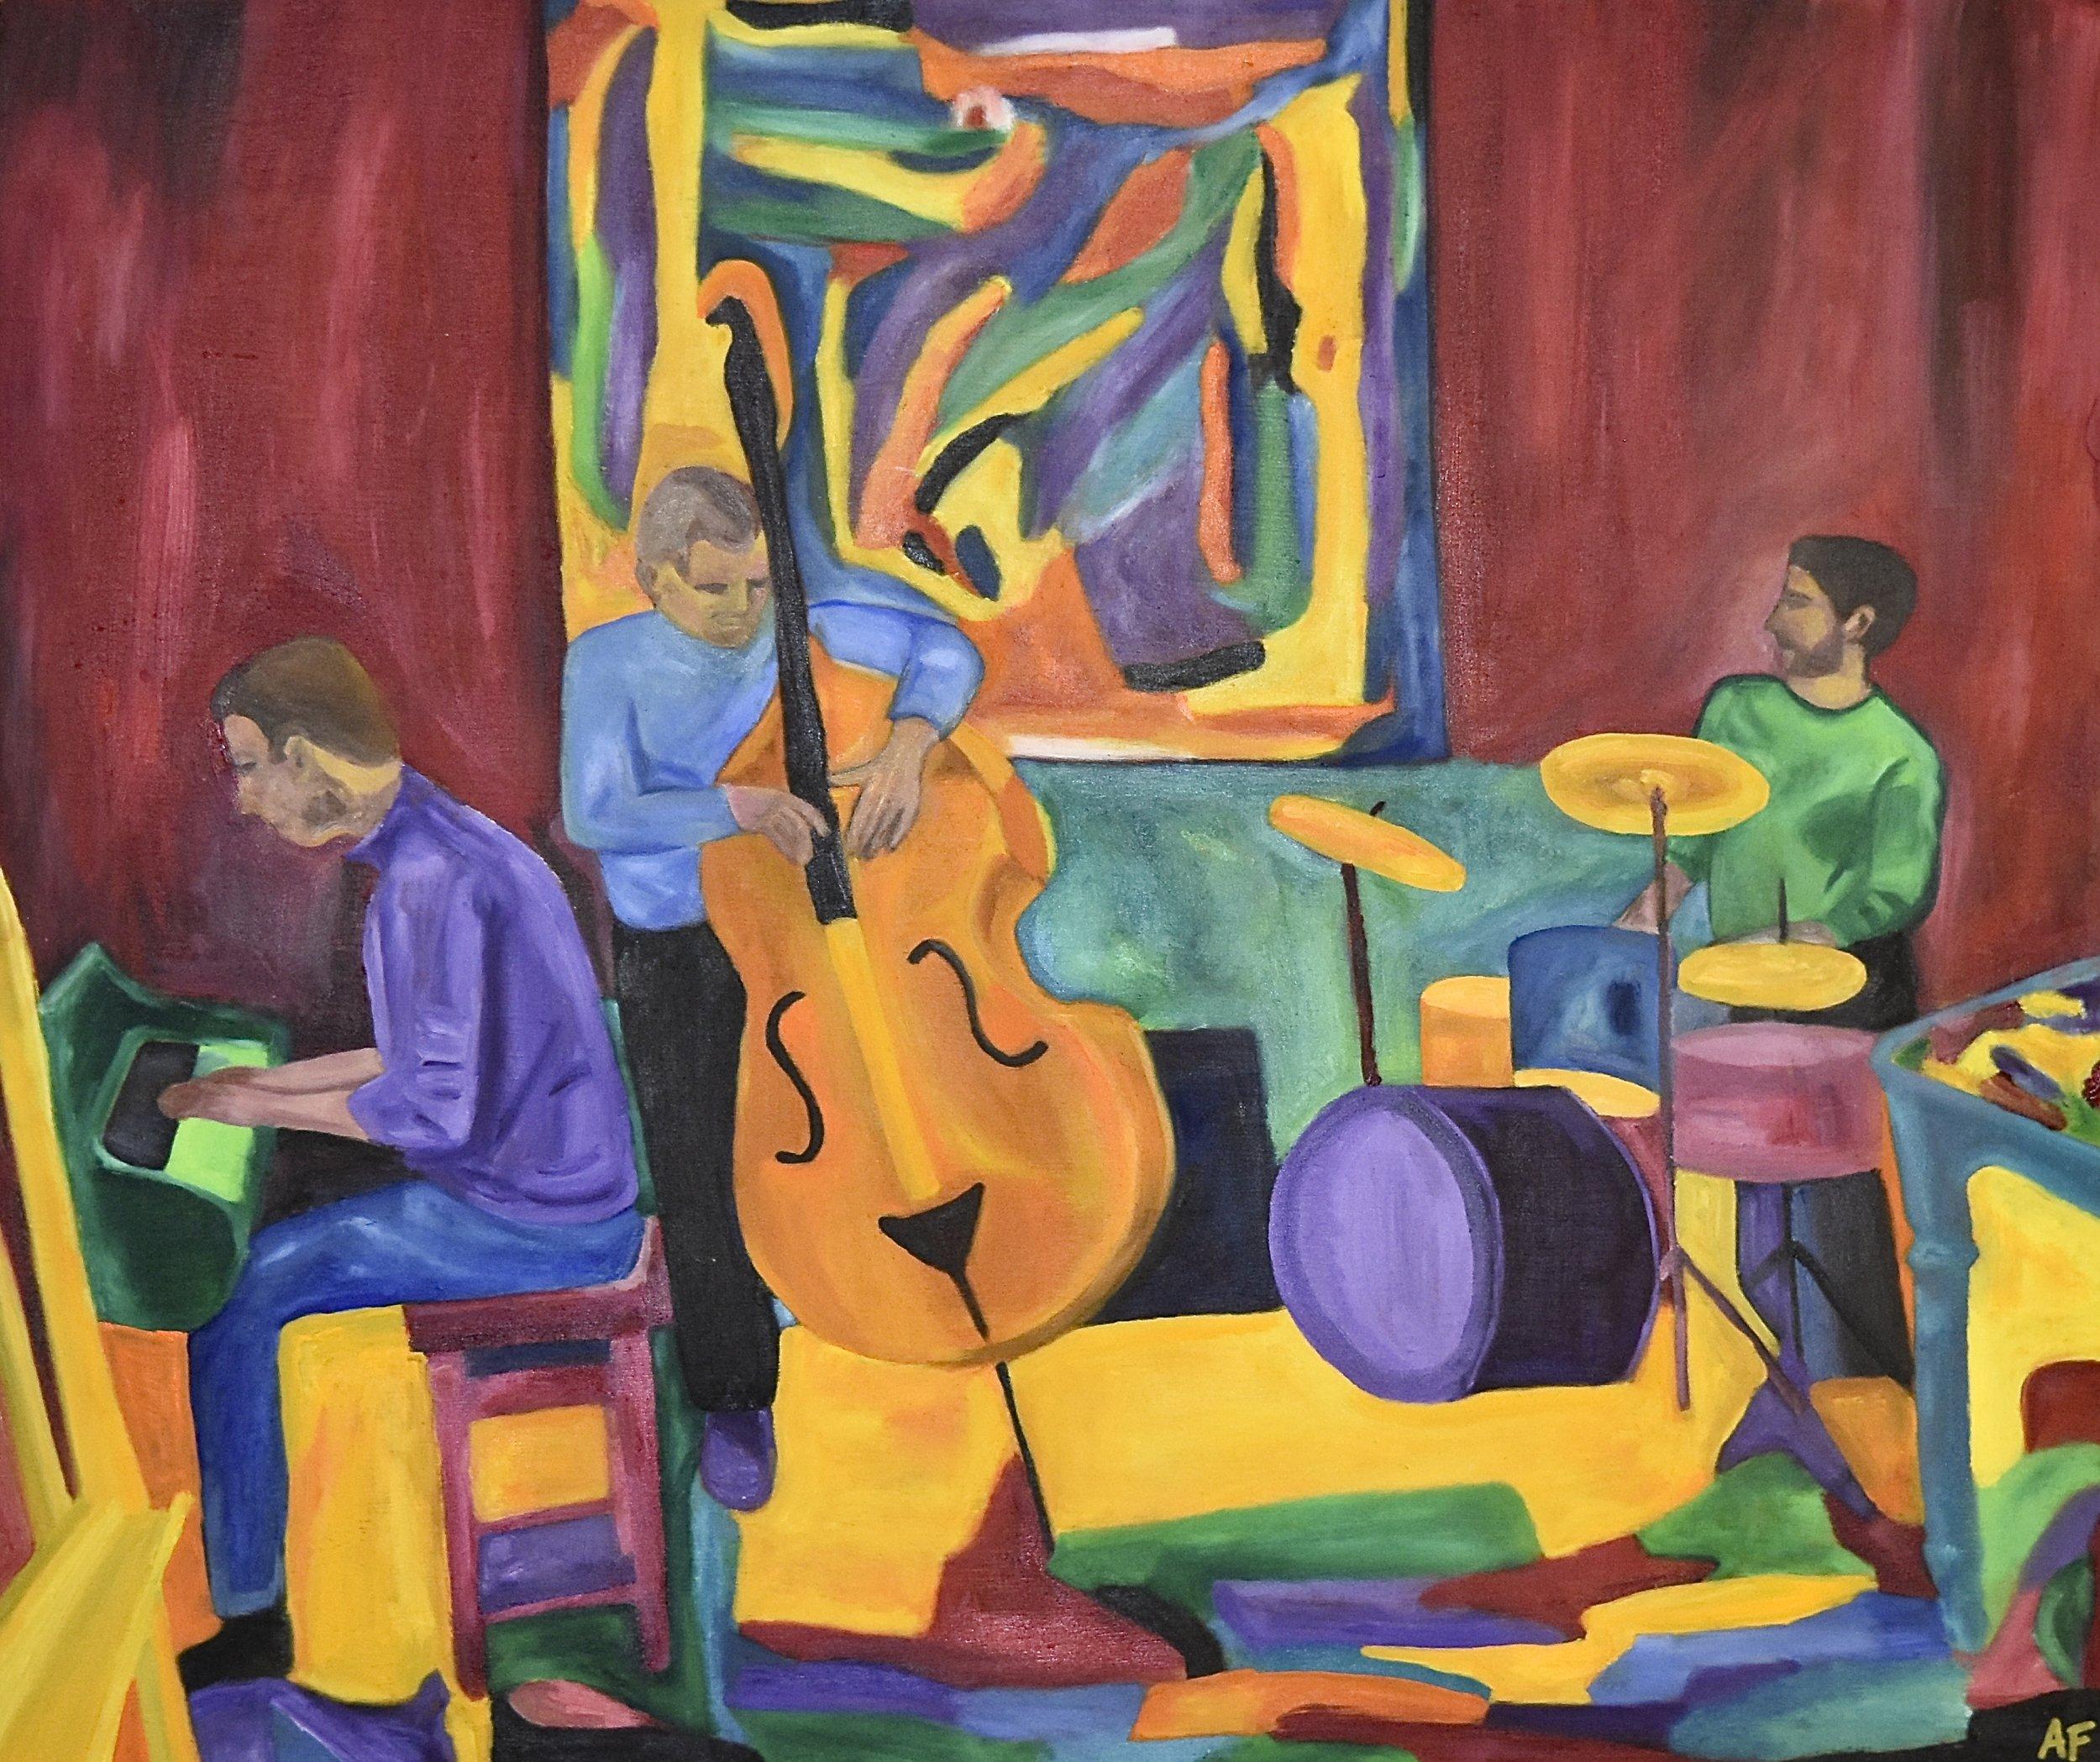 Résonances, Vortex Jazz Club, 14th November 2017. Oil on wood, 2018. 21 x 25 in